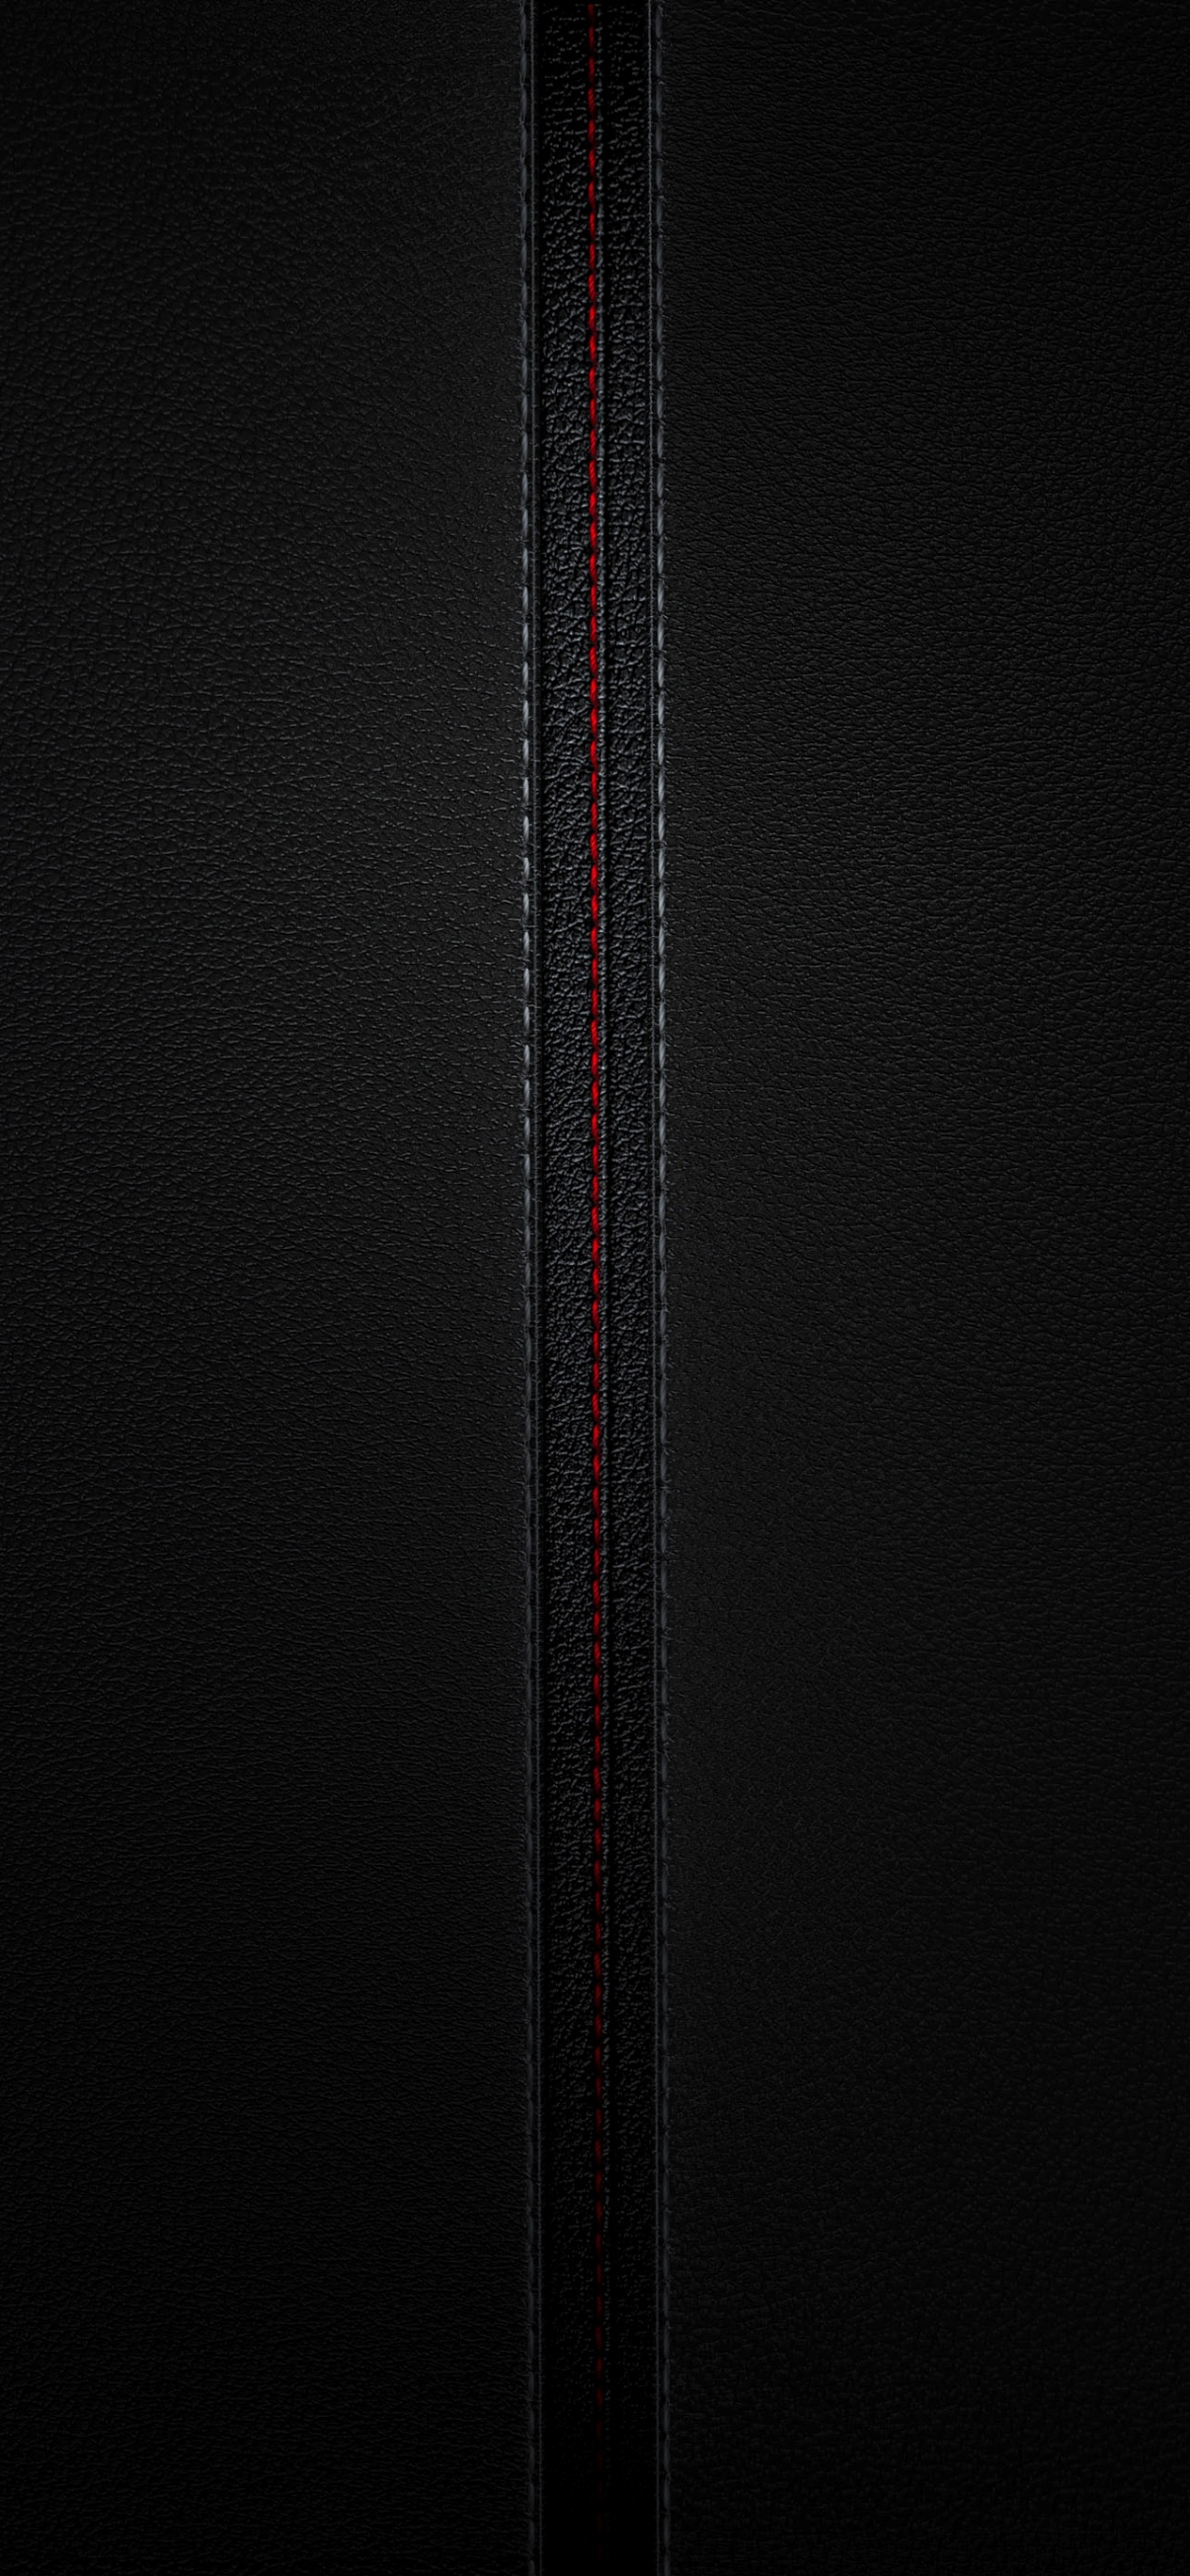 cool dark leather background wallpaper